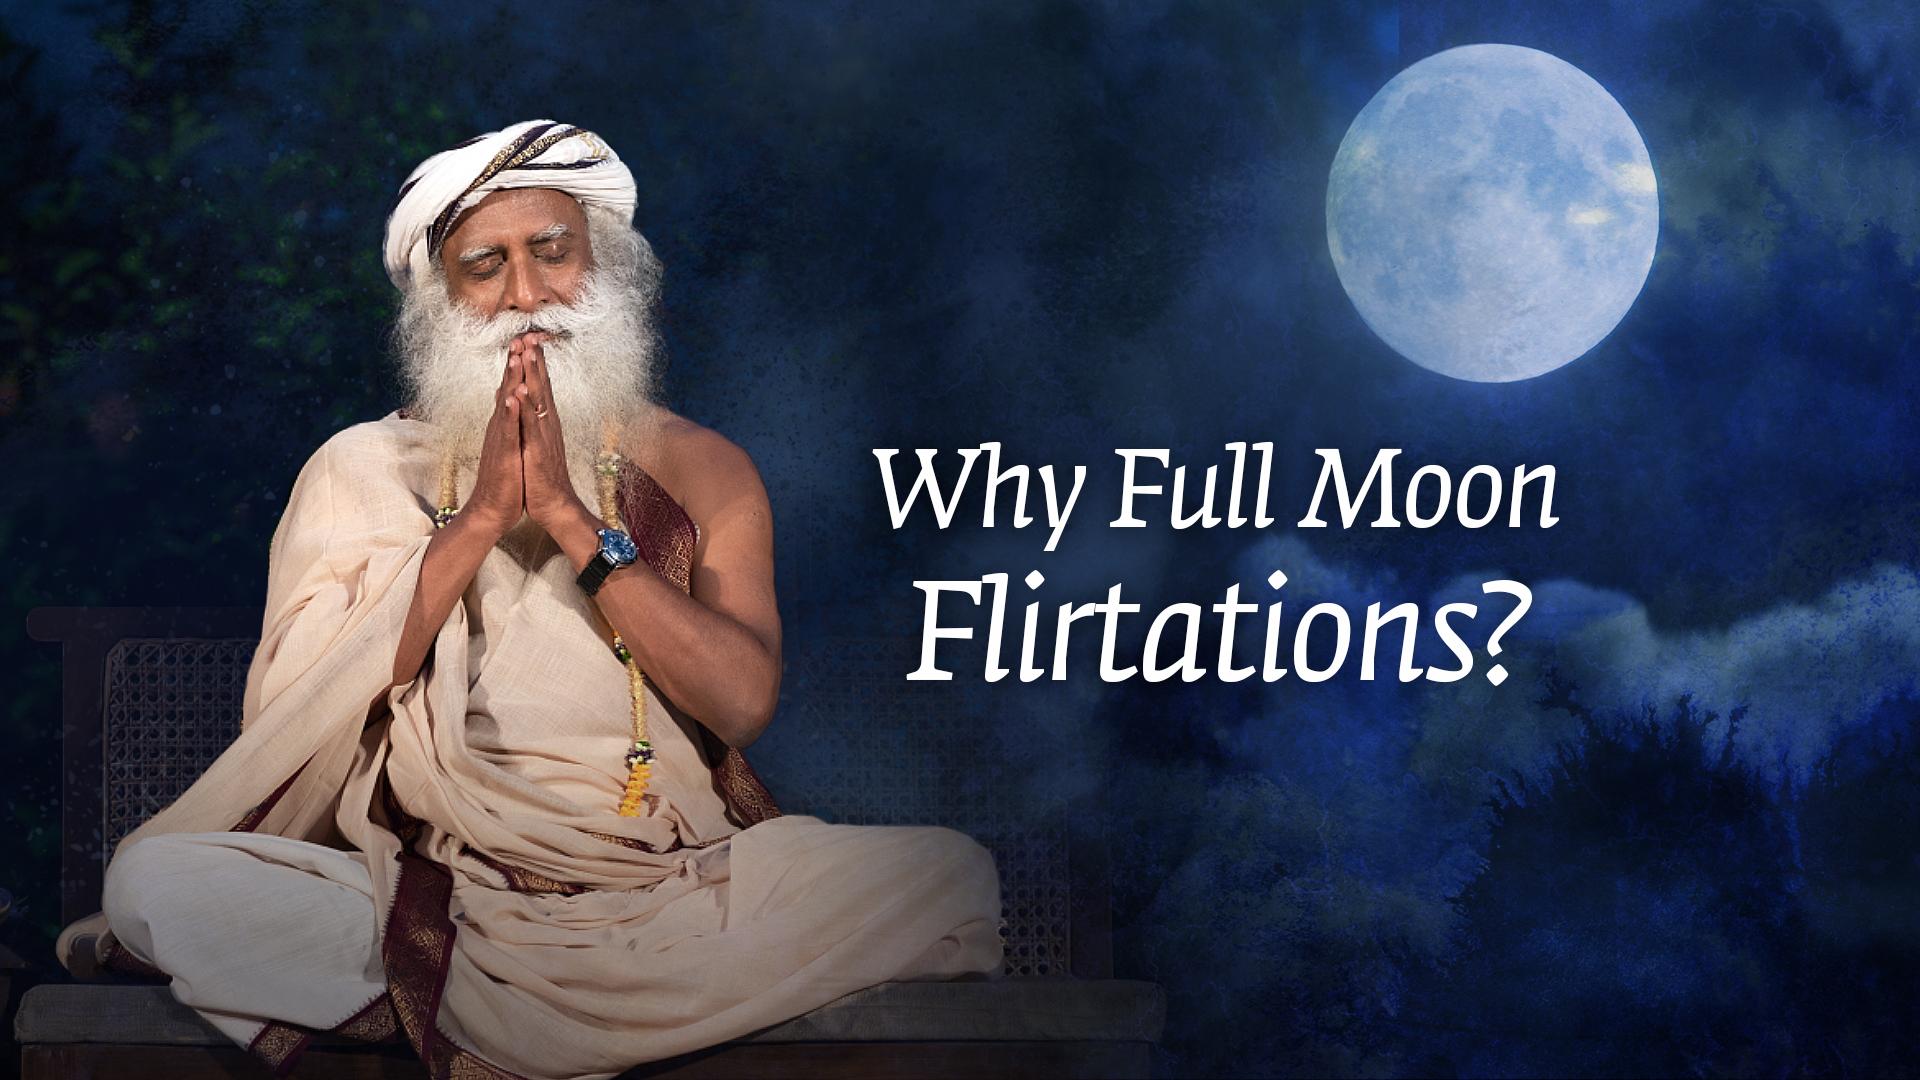 Full Moon Flirtations with Sadhguru